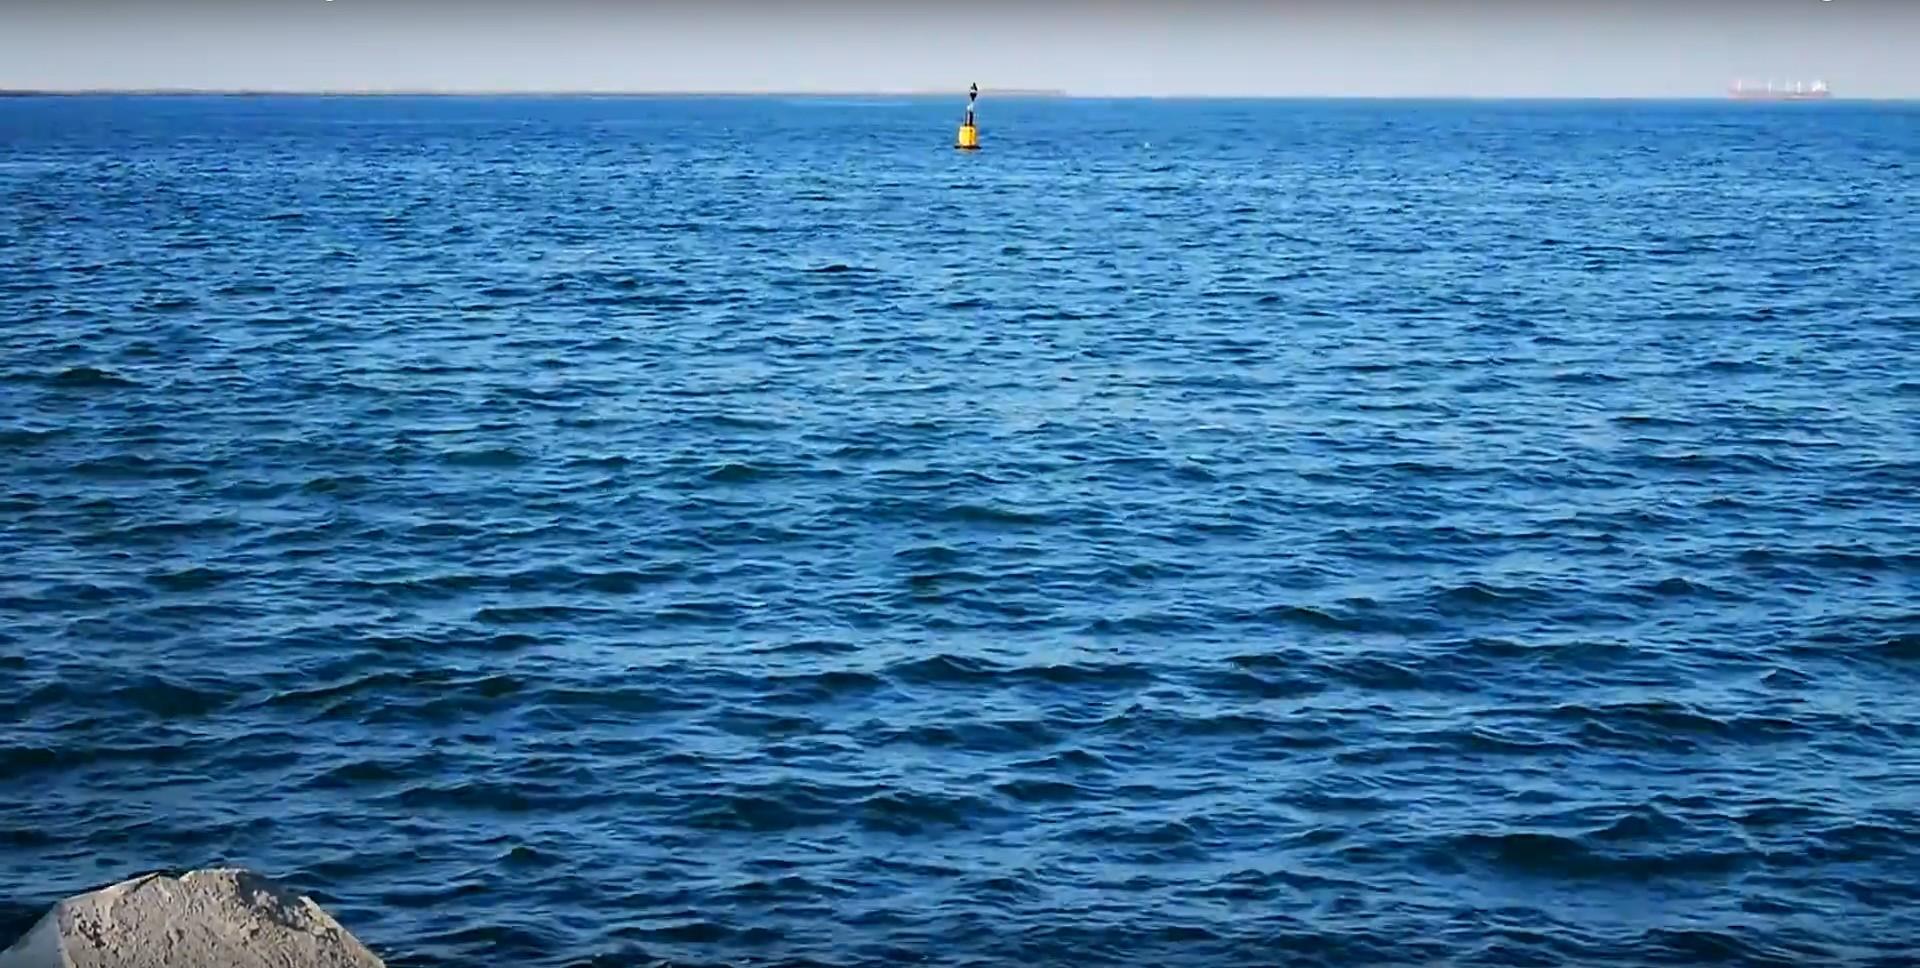 Amintiri de la Marea Neagra